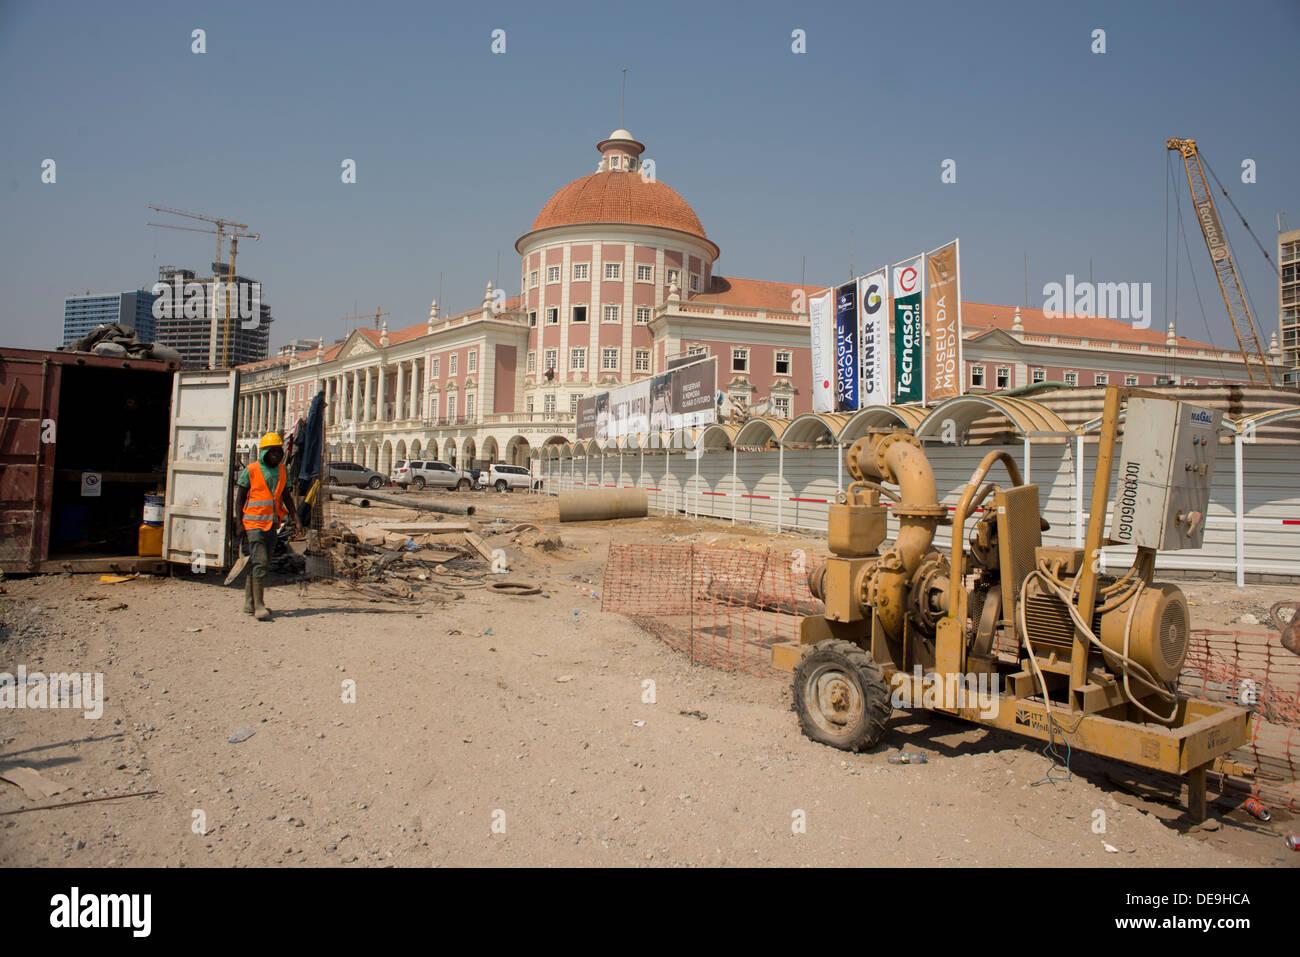 Building site, Luanda, Angola - Stock Image